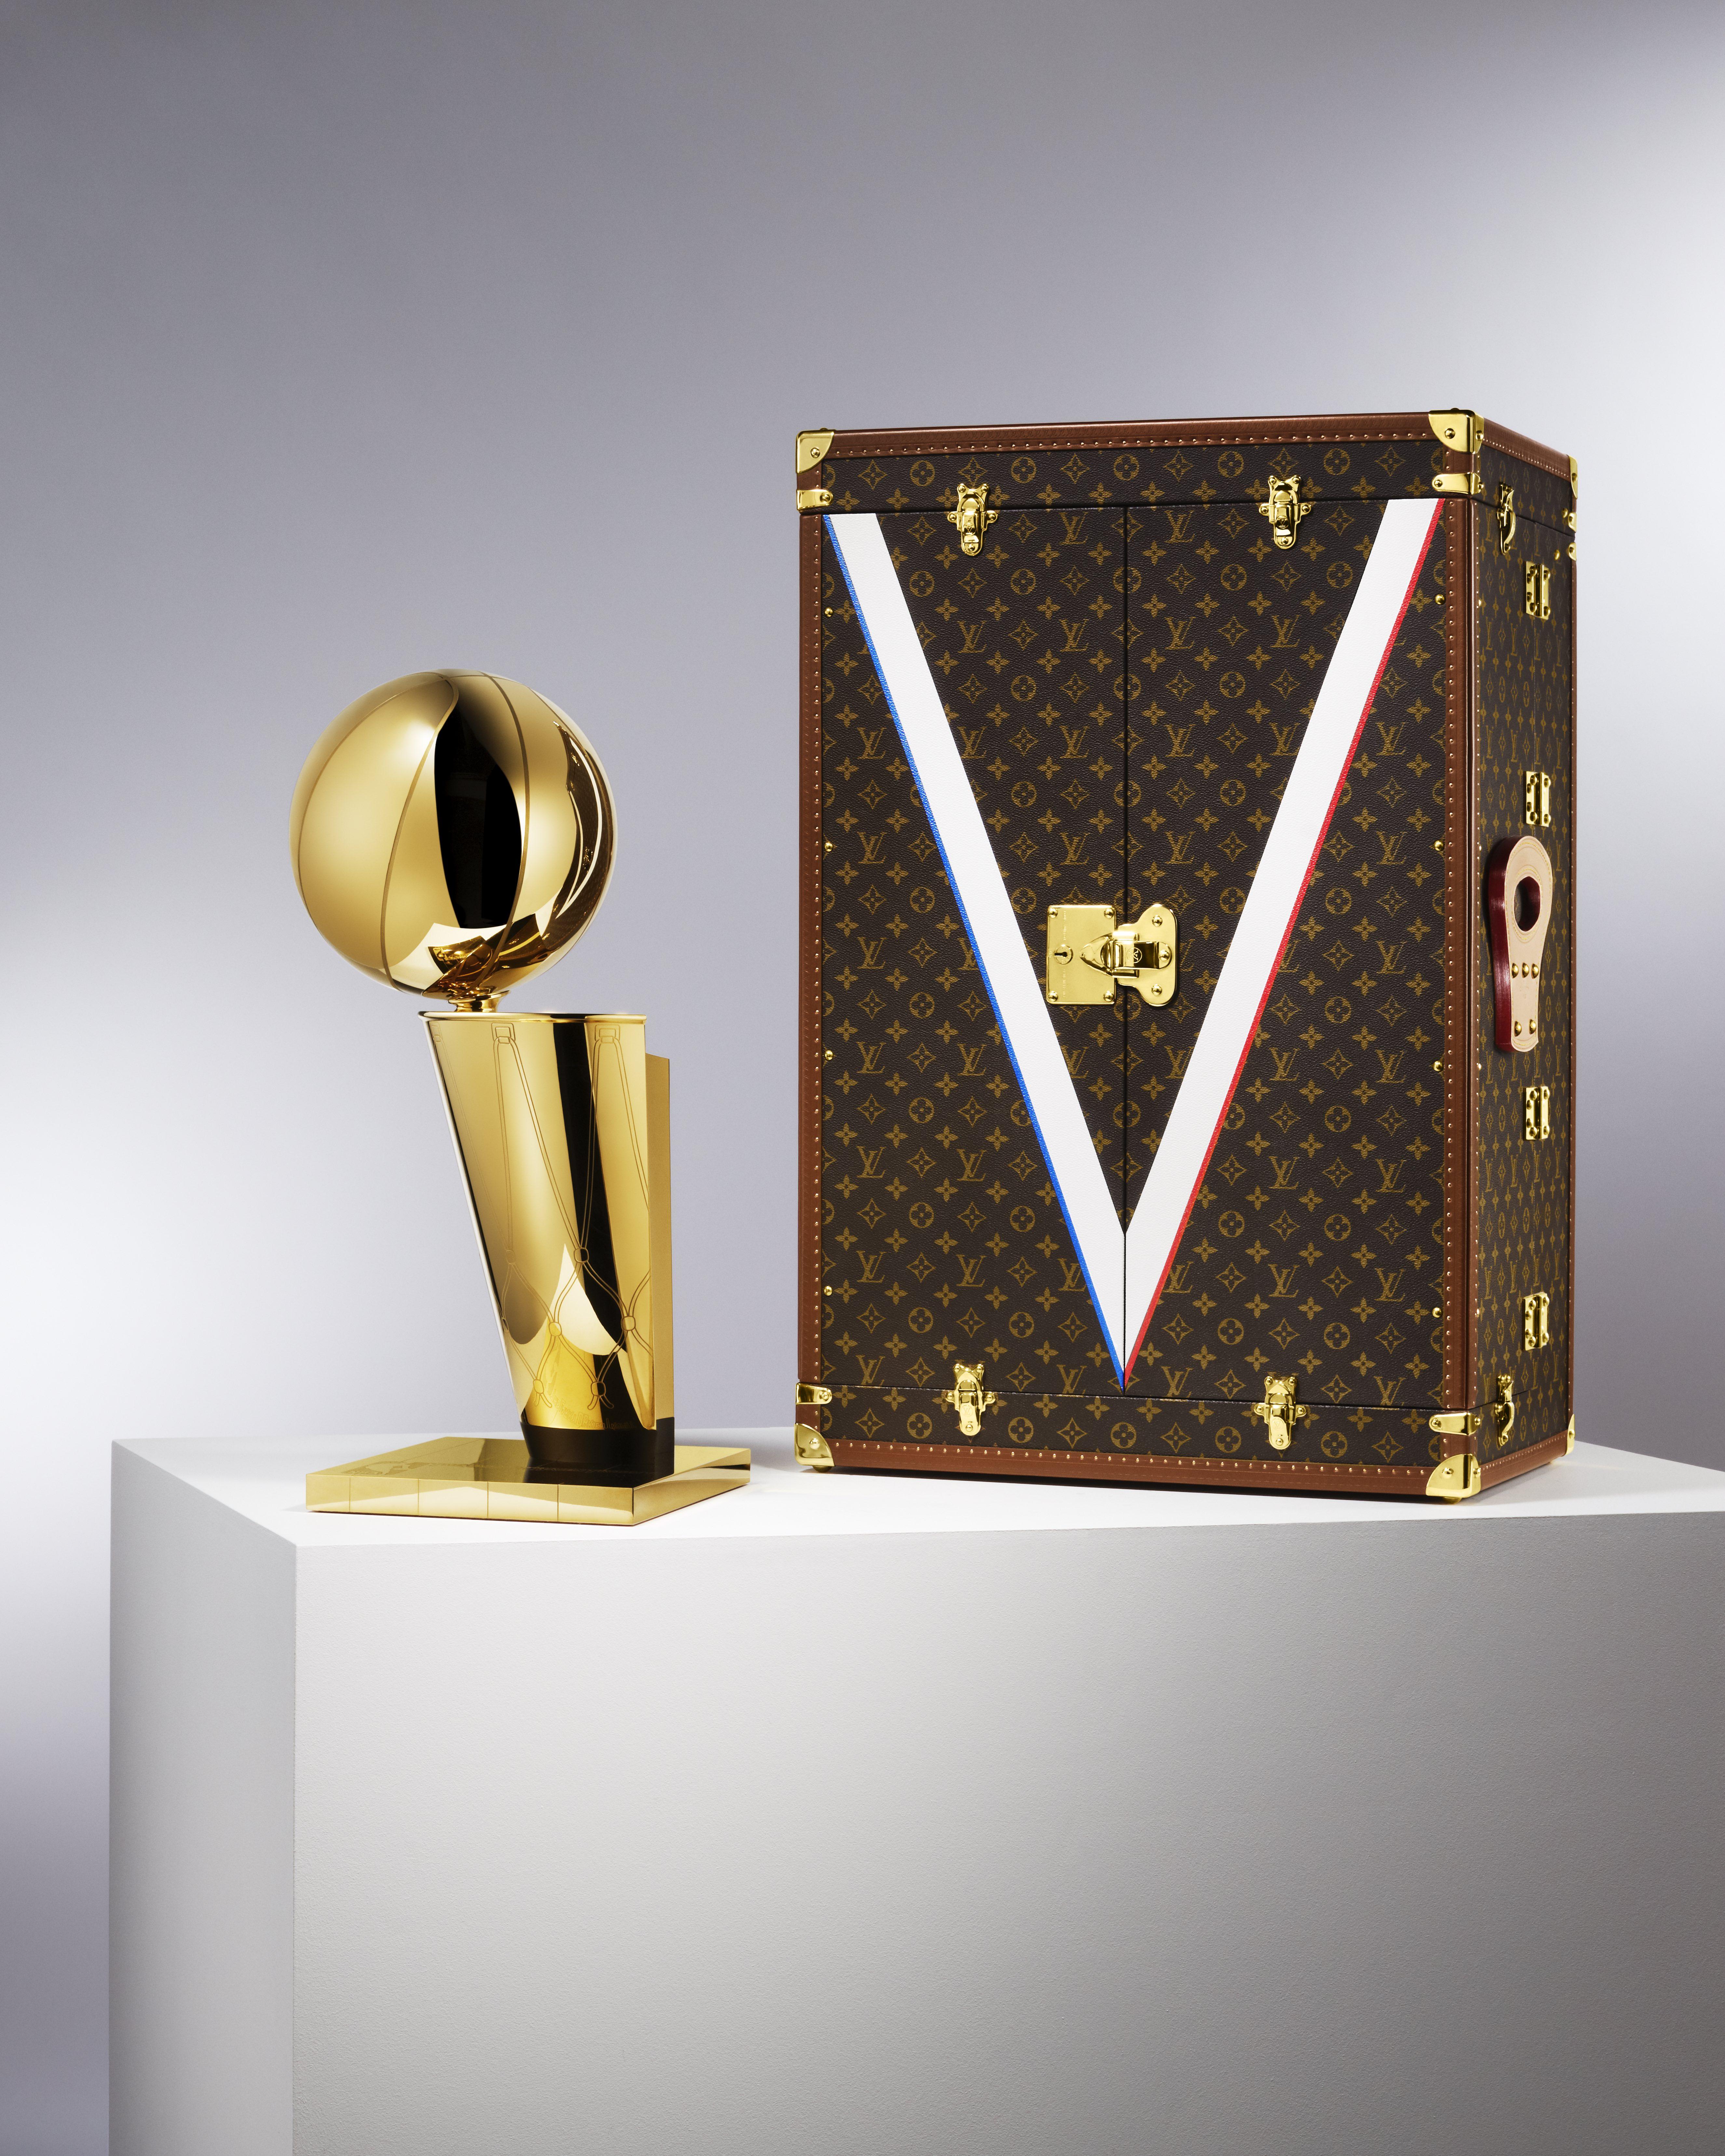 Louis Vuitton's travel case next to the NBA's championship trophy